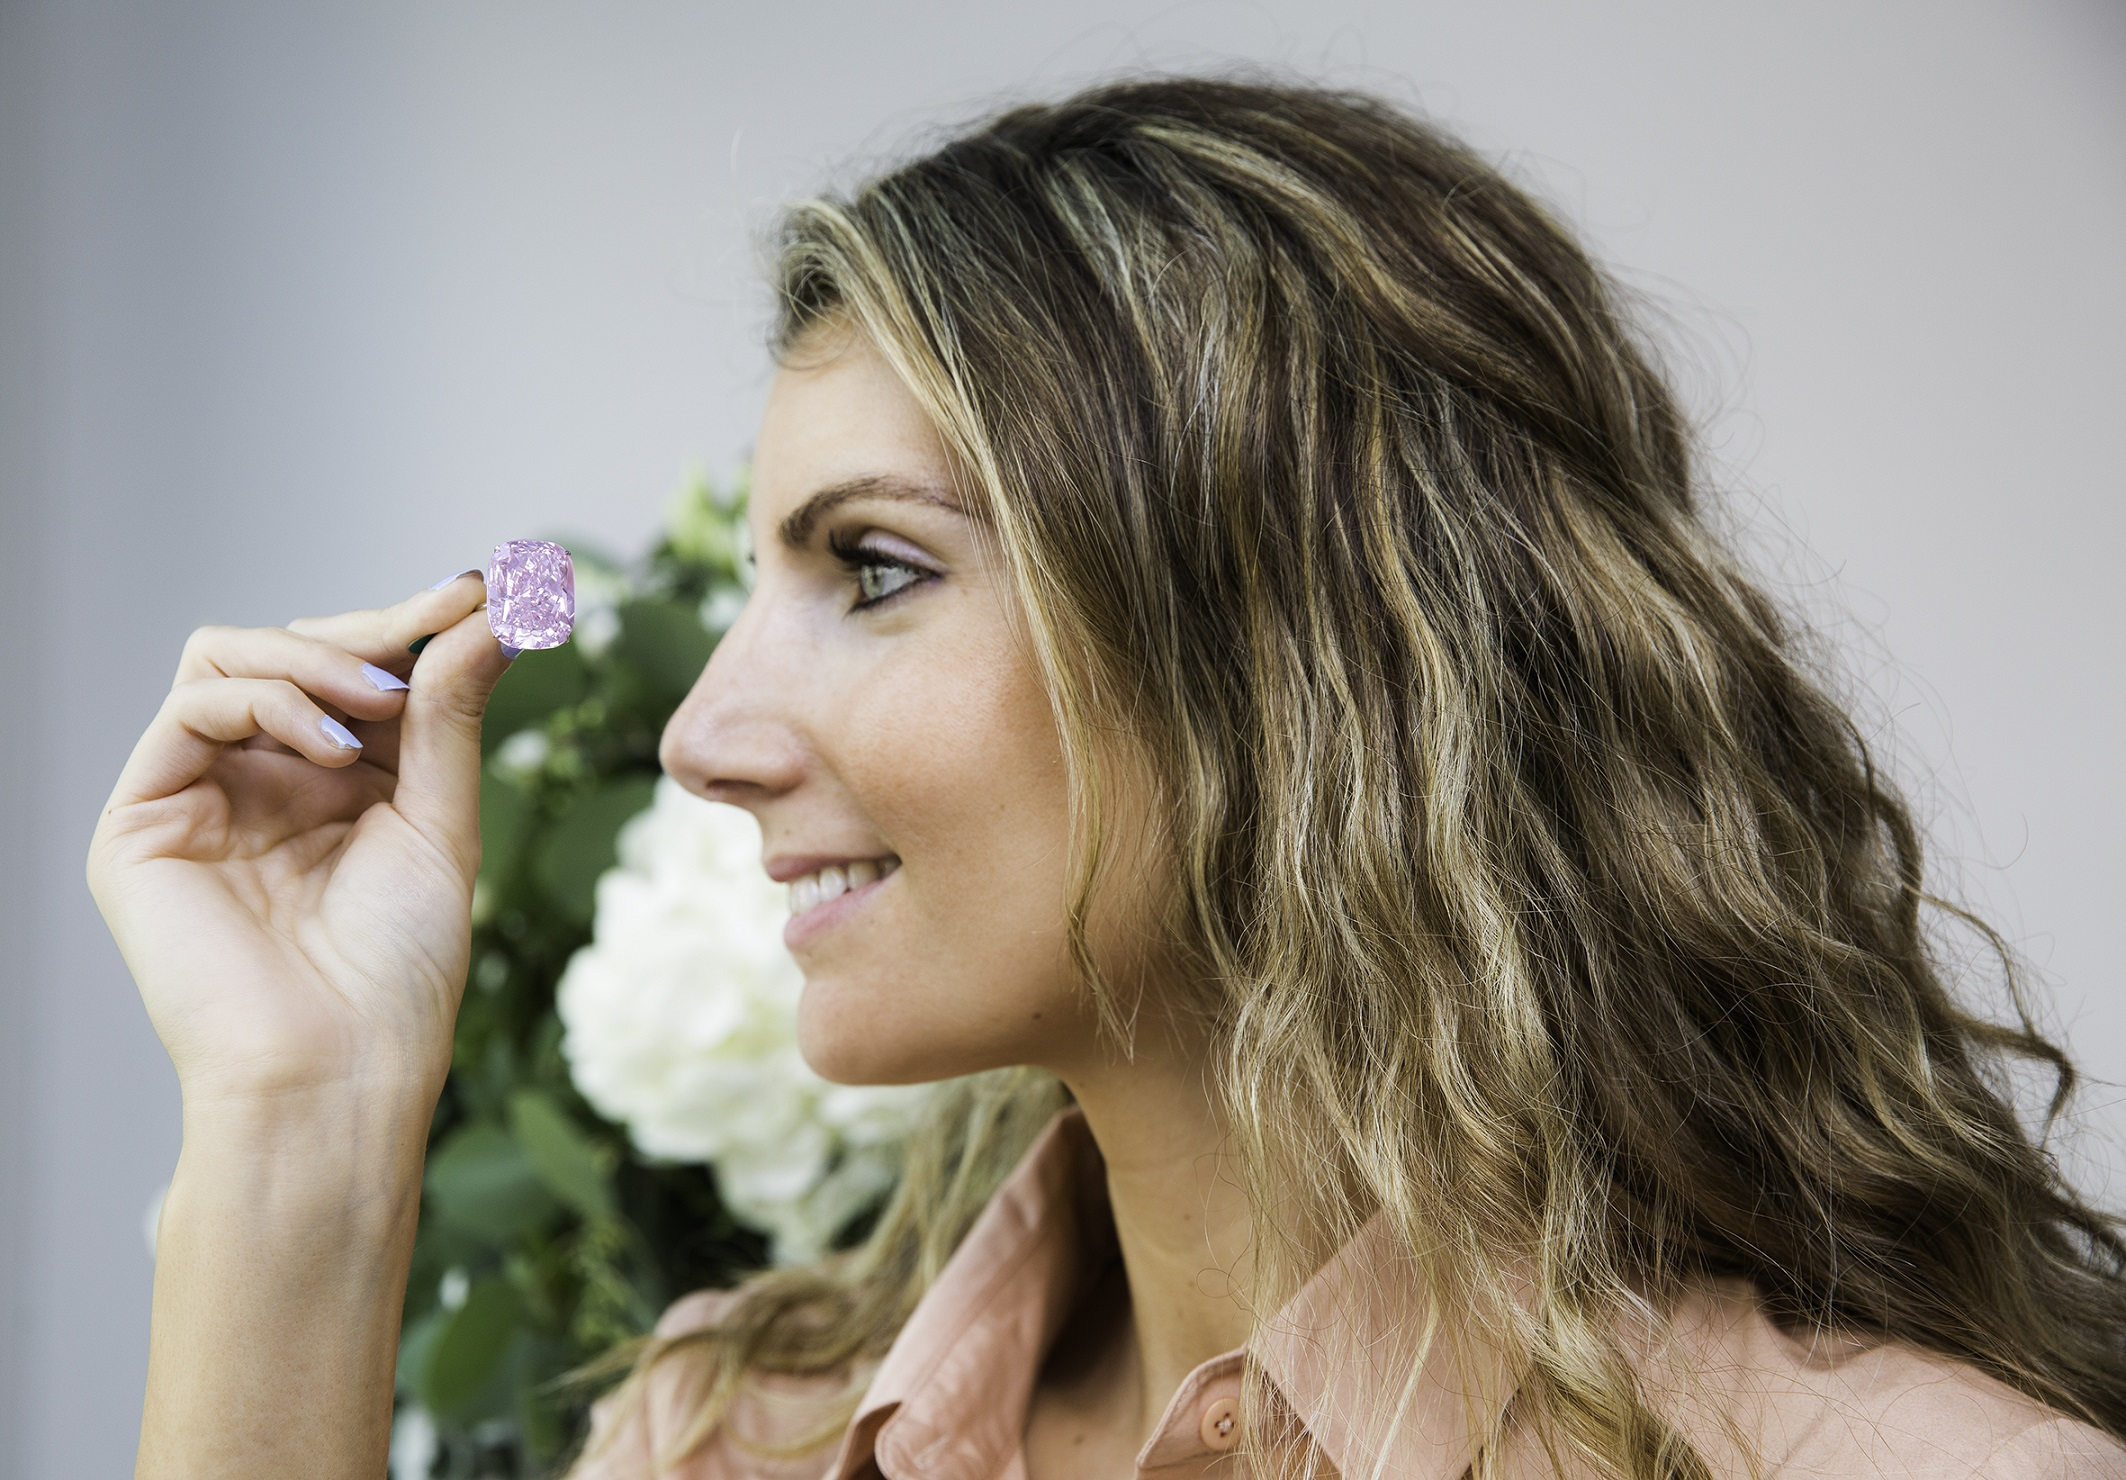 Katia Nounou, Head of Sotheby's Dubai with 'The Raj Pink' diamond. Image courtesy of Sotheby's Dubai.